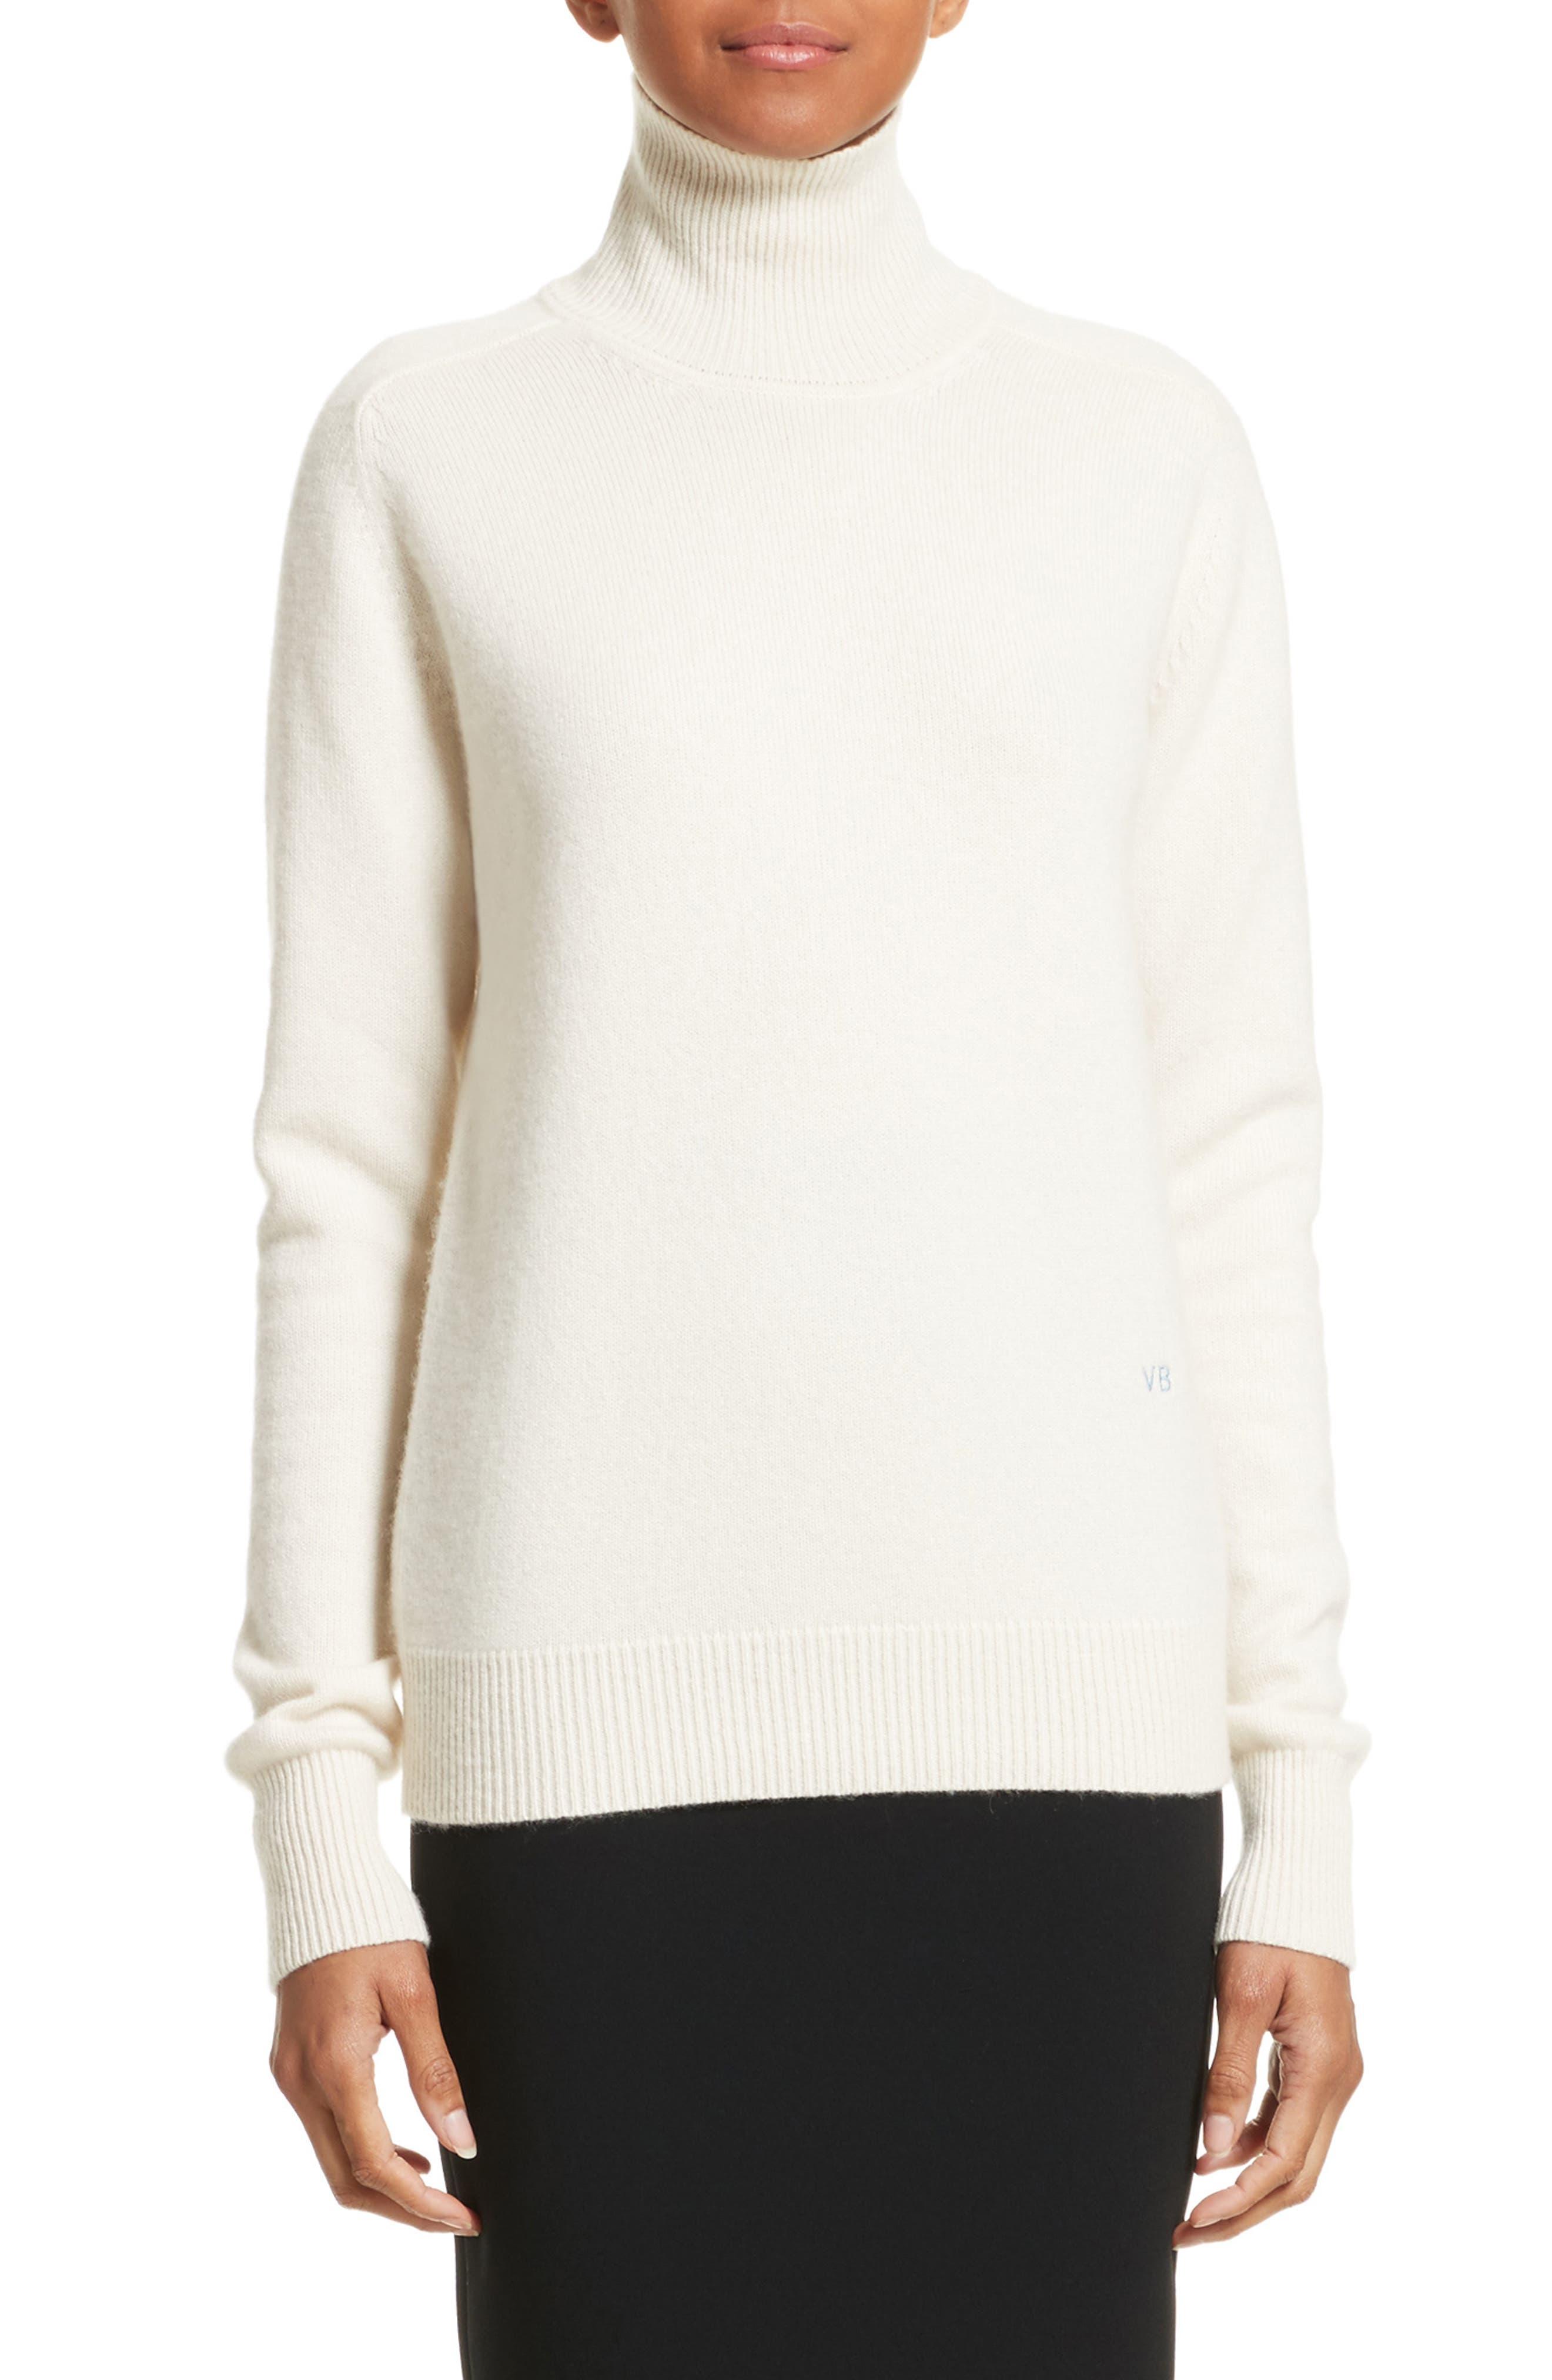 VICTORIA BECKHAM Cashmere Turtleneck Sweater, Main, color, VANILLA